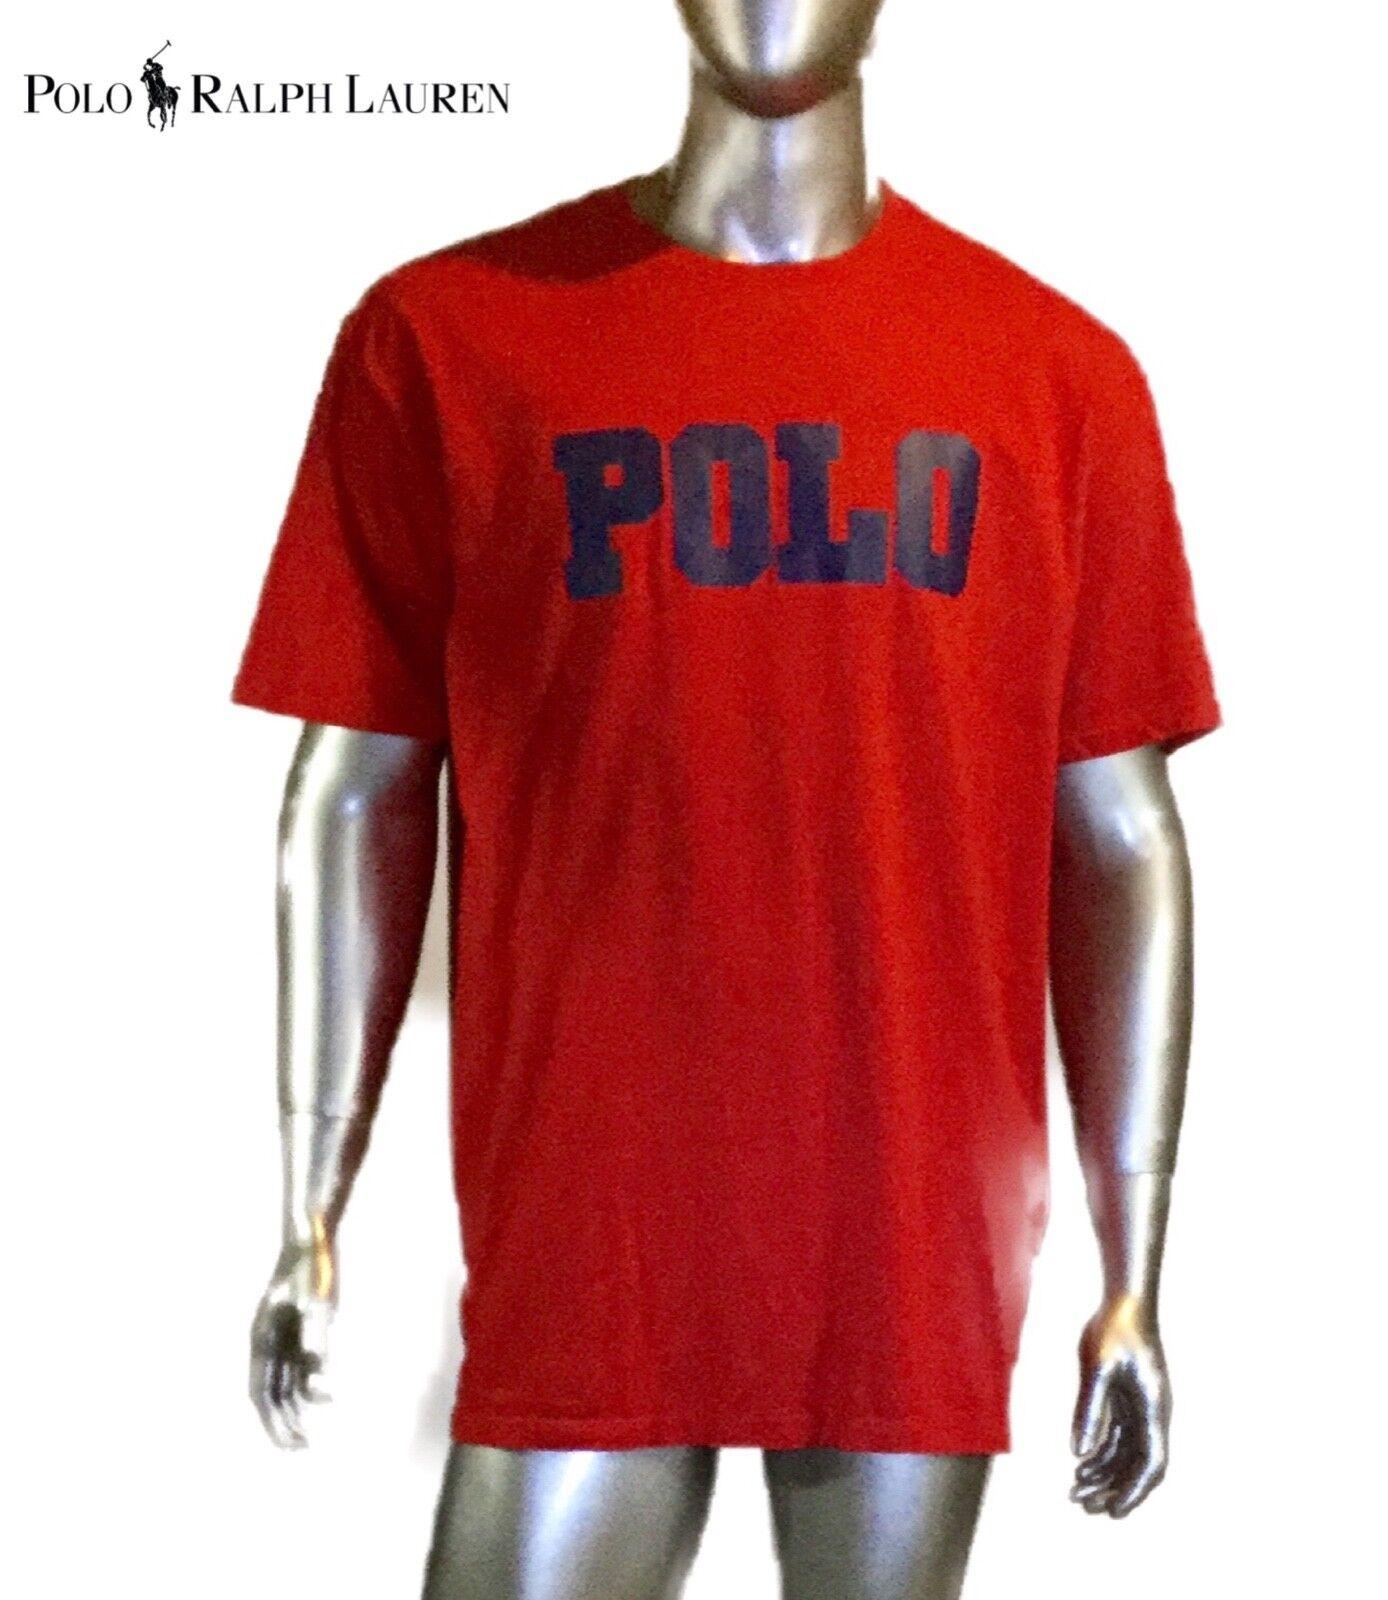 Vtg 27.4ms Polo Sport T-Shirt Spellout Logo Herren Größe XL, Rot